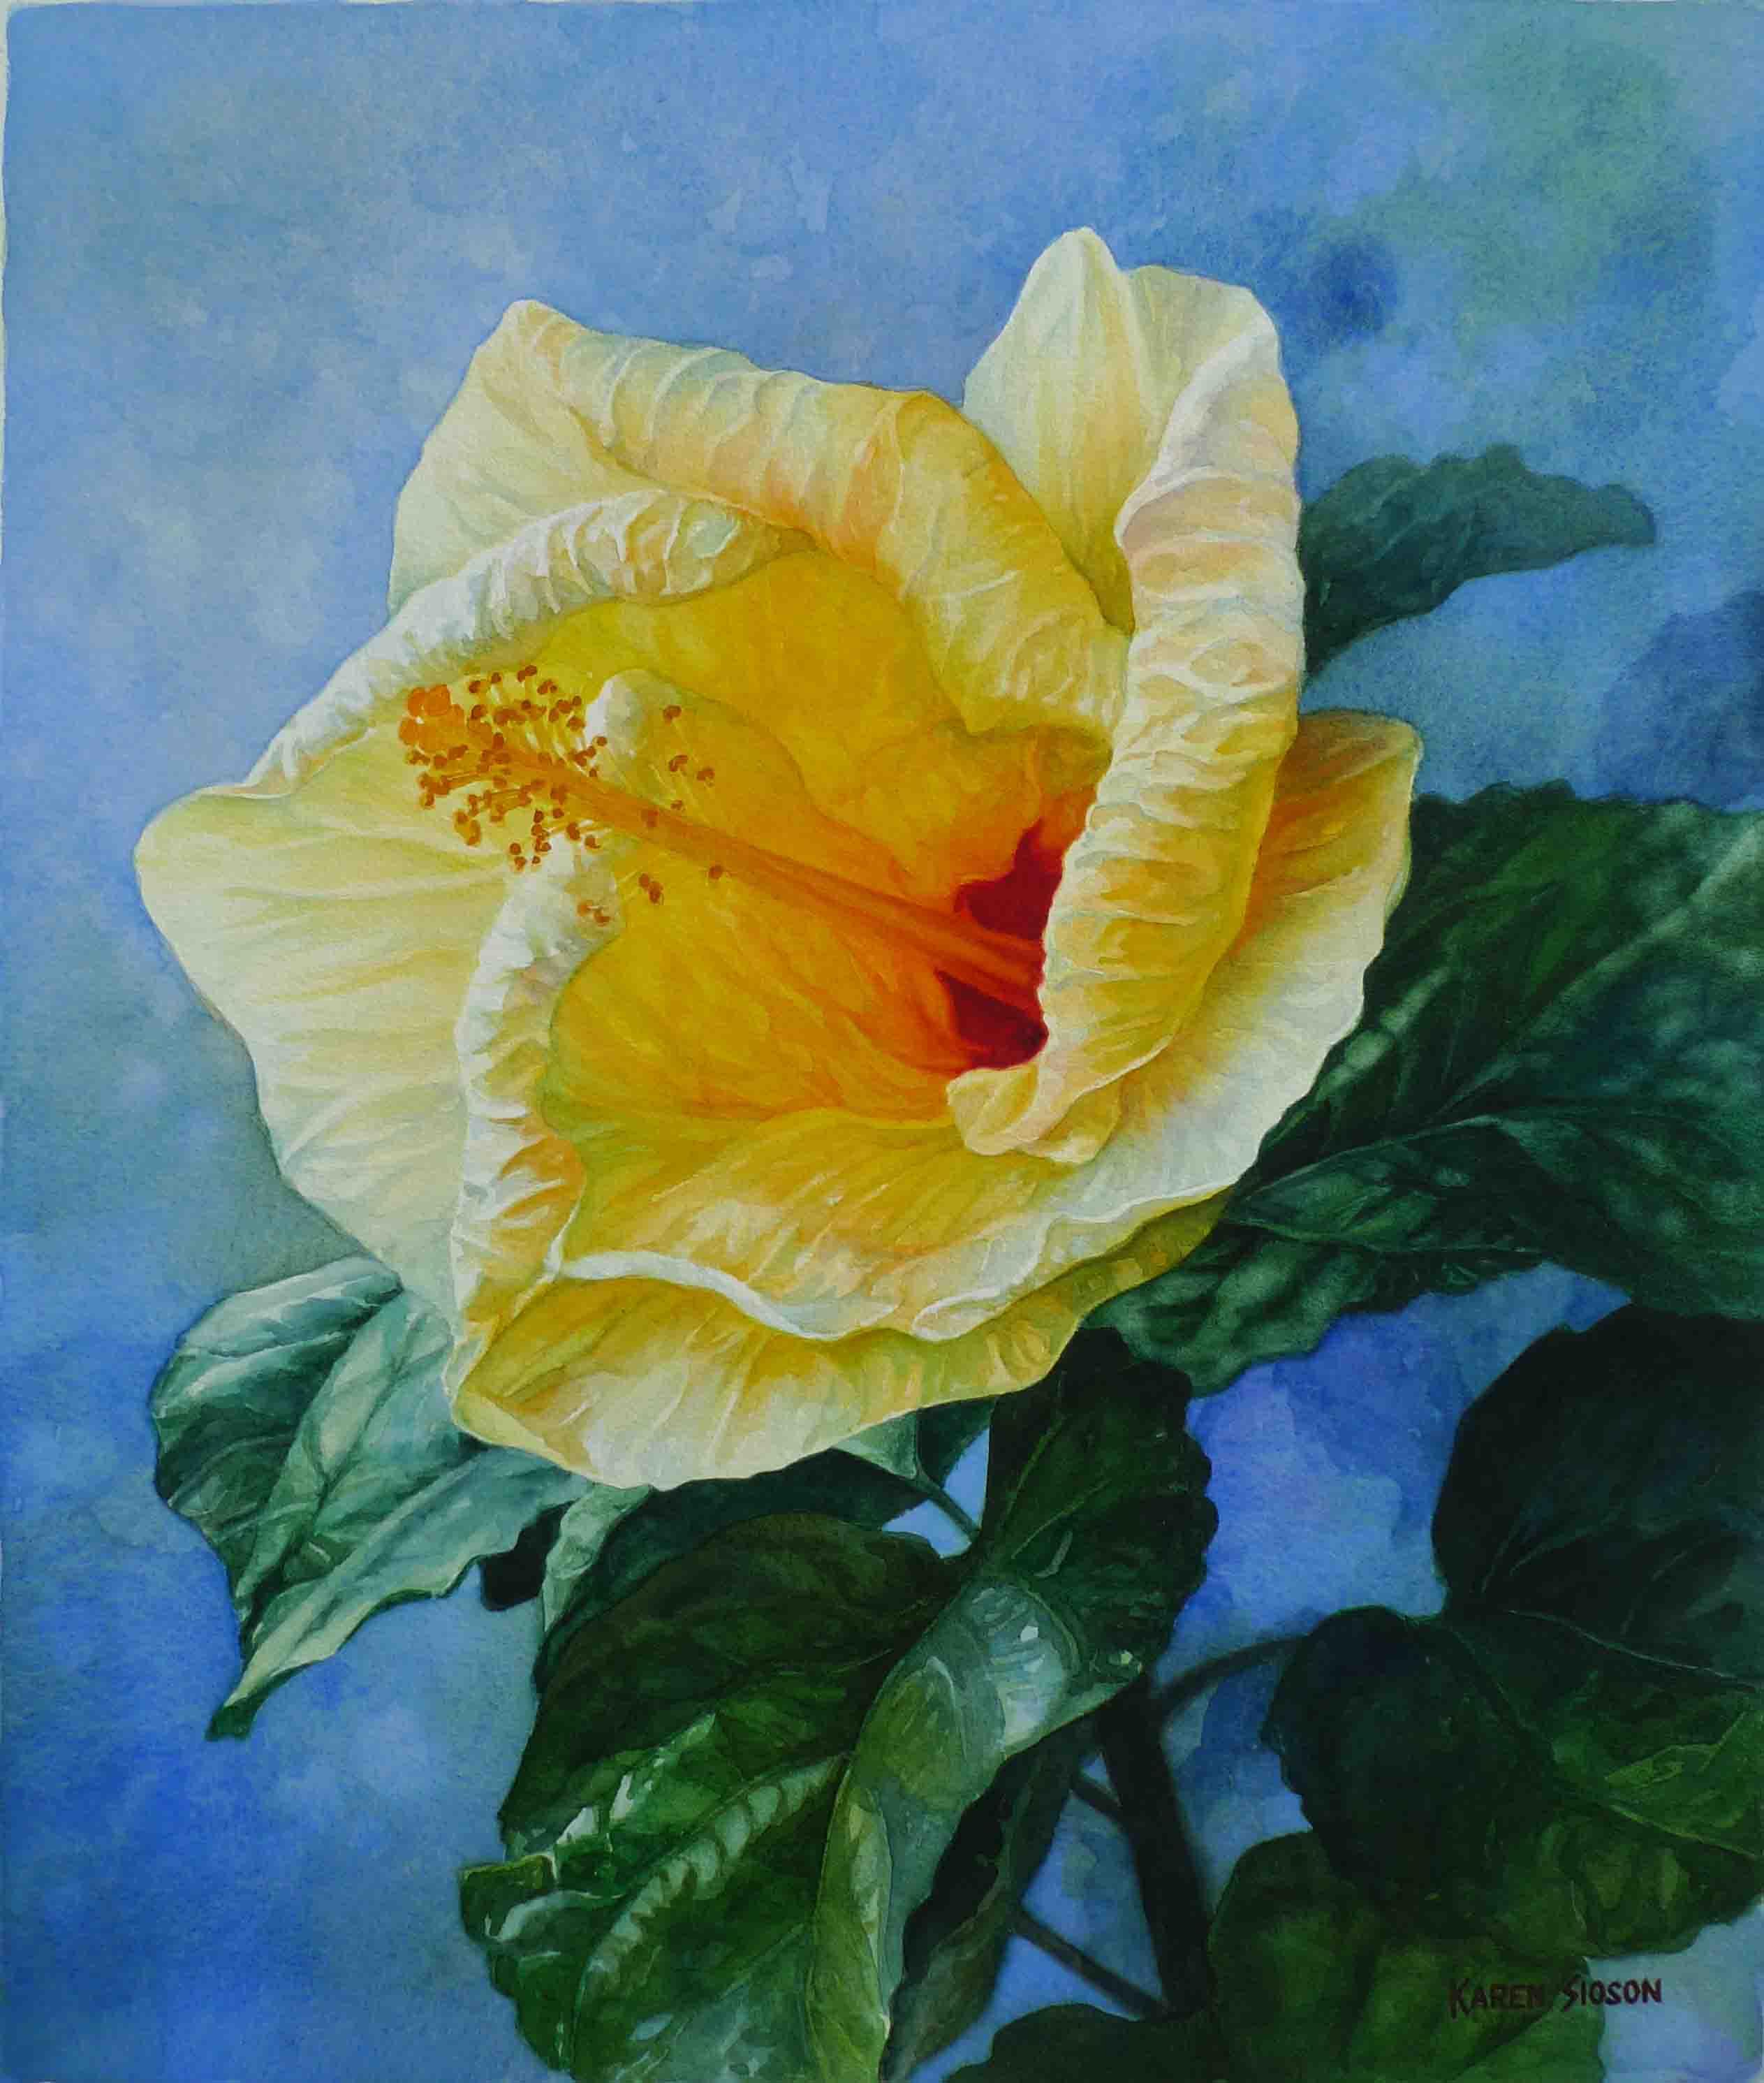 karensioson_sunlit_yellow_hibiscus